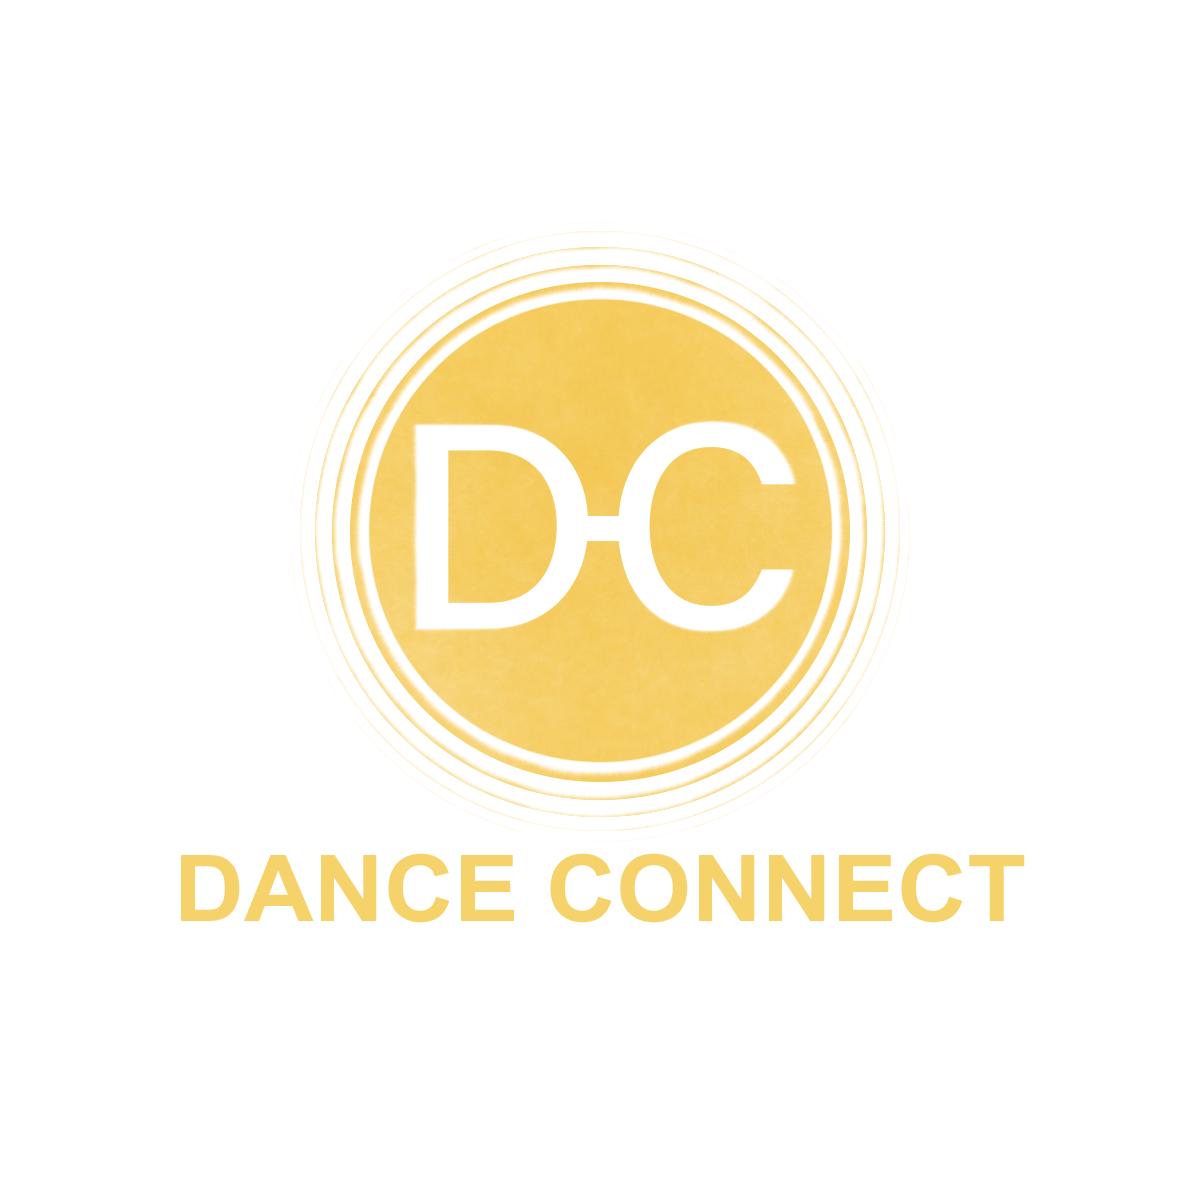 Разработка лого для спортивного портала www.danceconnect.ru фото f_8865b437d25dd5d1.png